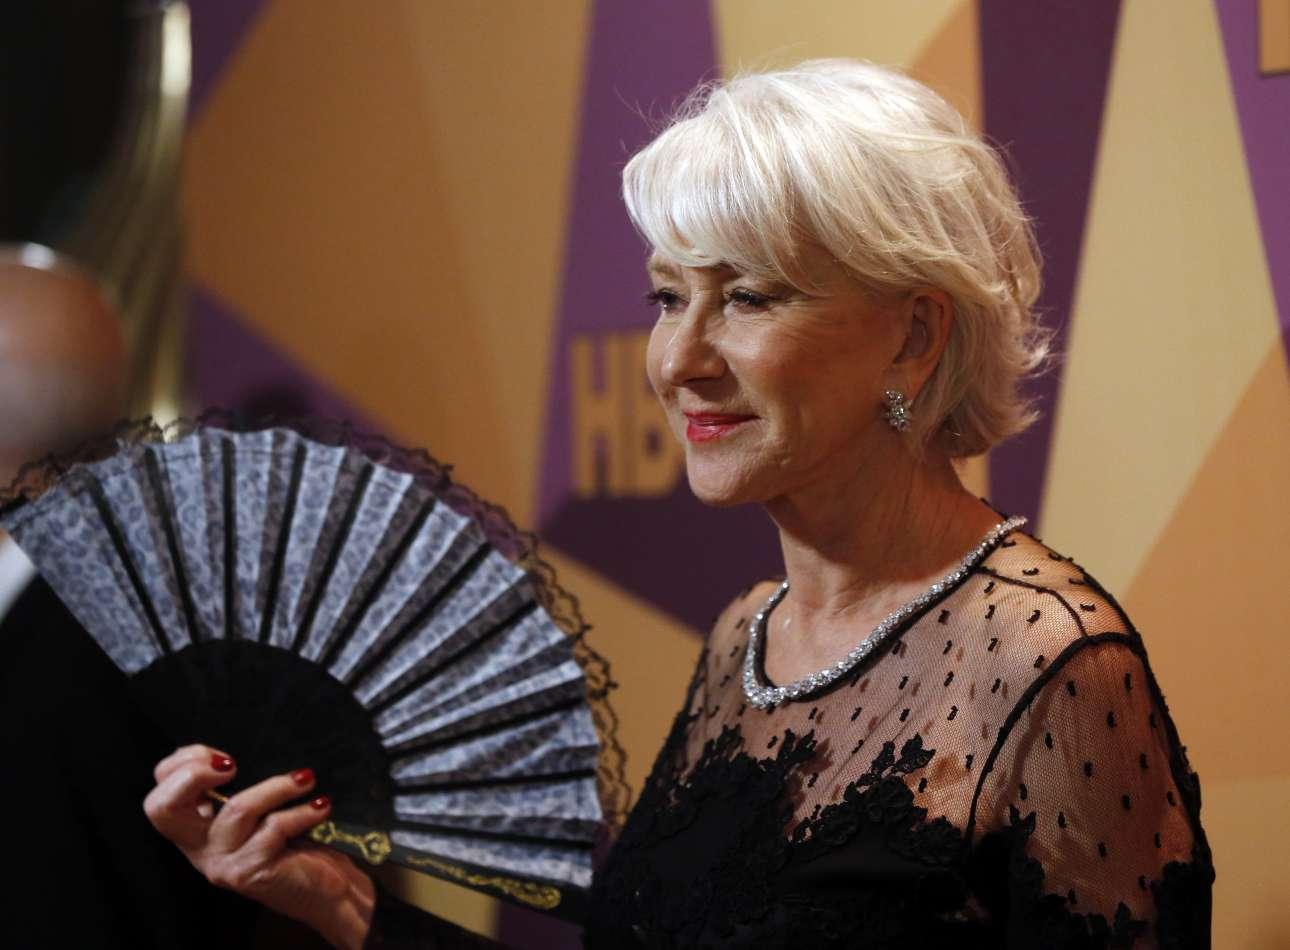 H Ελεν Μίρεν, και αυτή στα μαύρα, καταφθάνει στο πάρτι για τις 75ες Χρυσές Σφαίρες